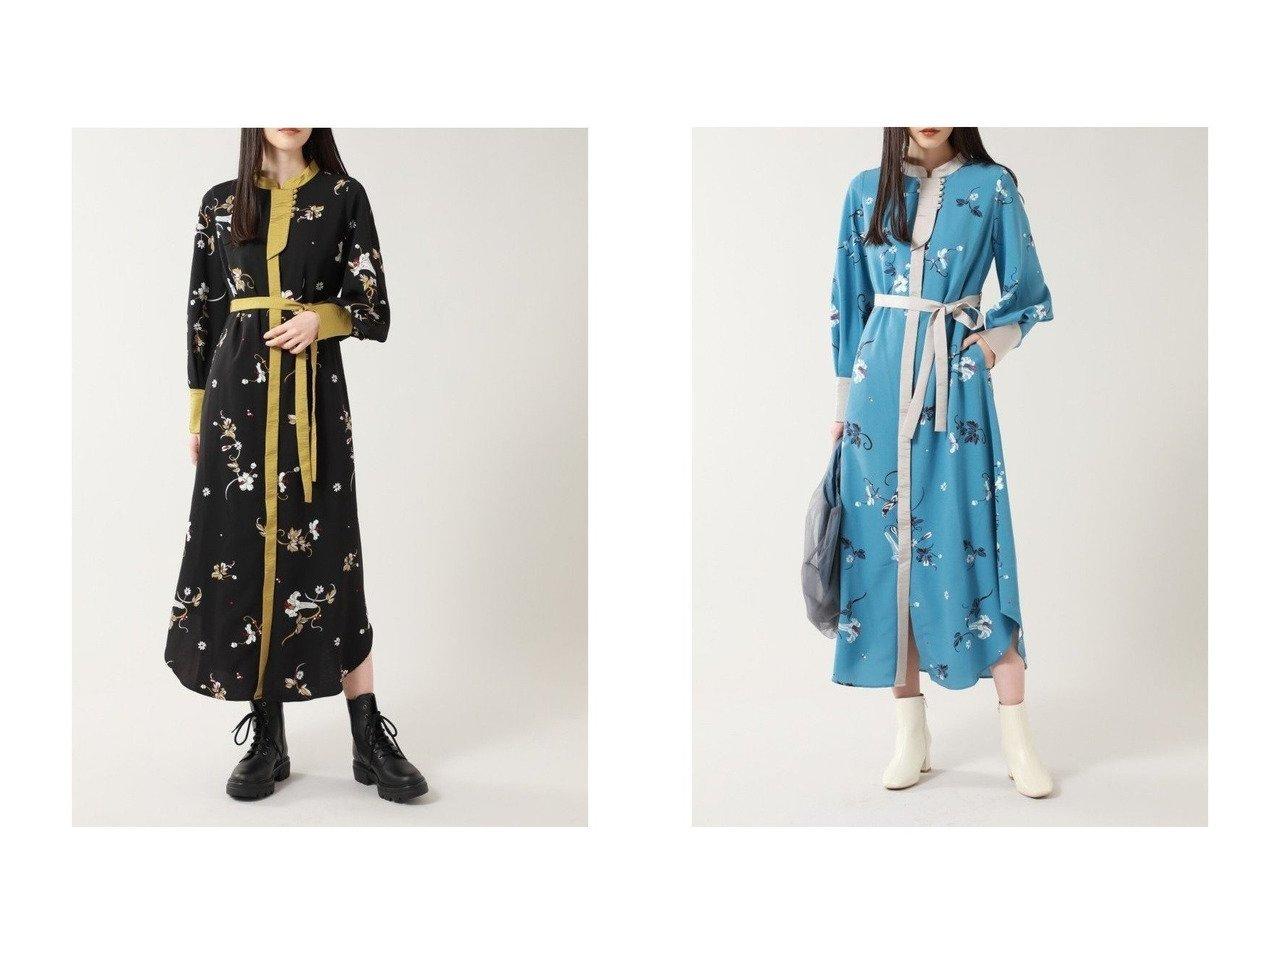 【ROSE BUD/ローズバッド】のオリエンタルプリントワンピース 【ワンピース・ドレス】おすすめ!人気、トレンド・レディースファッションの通販    レディースファッション・服の通販 founy(ファニー)